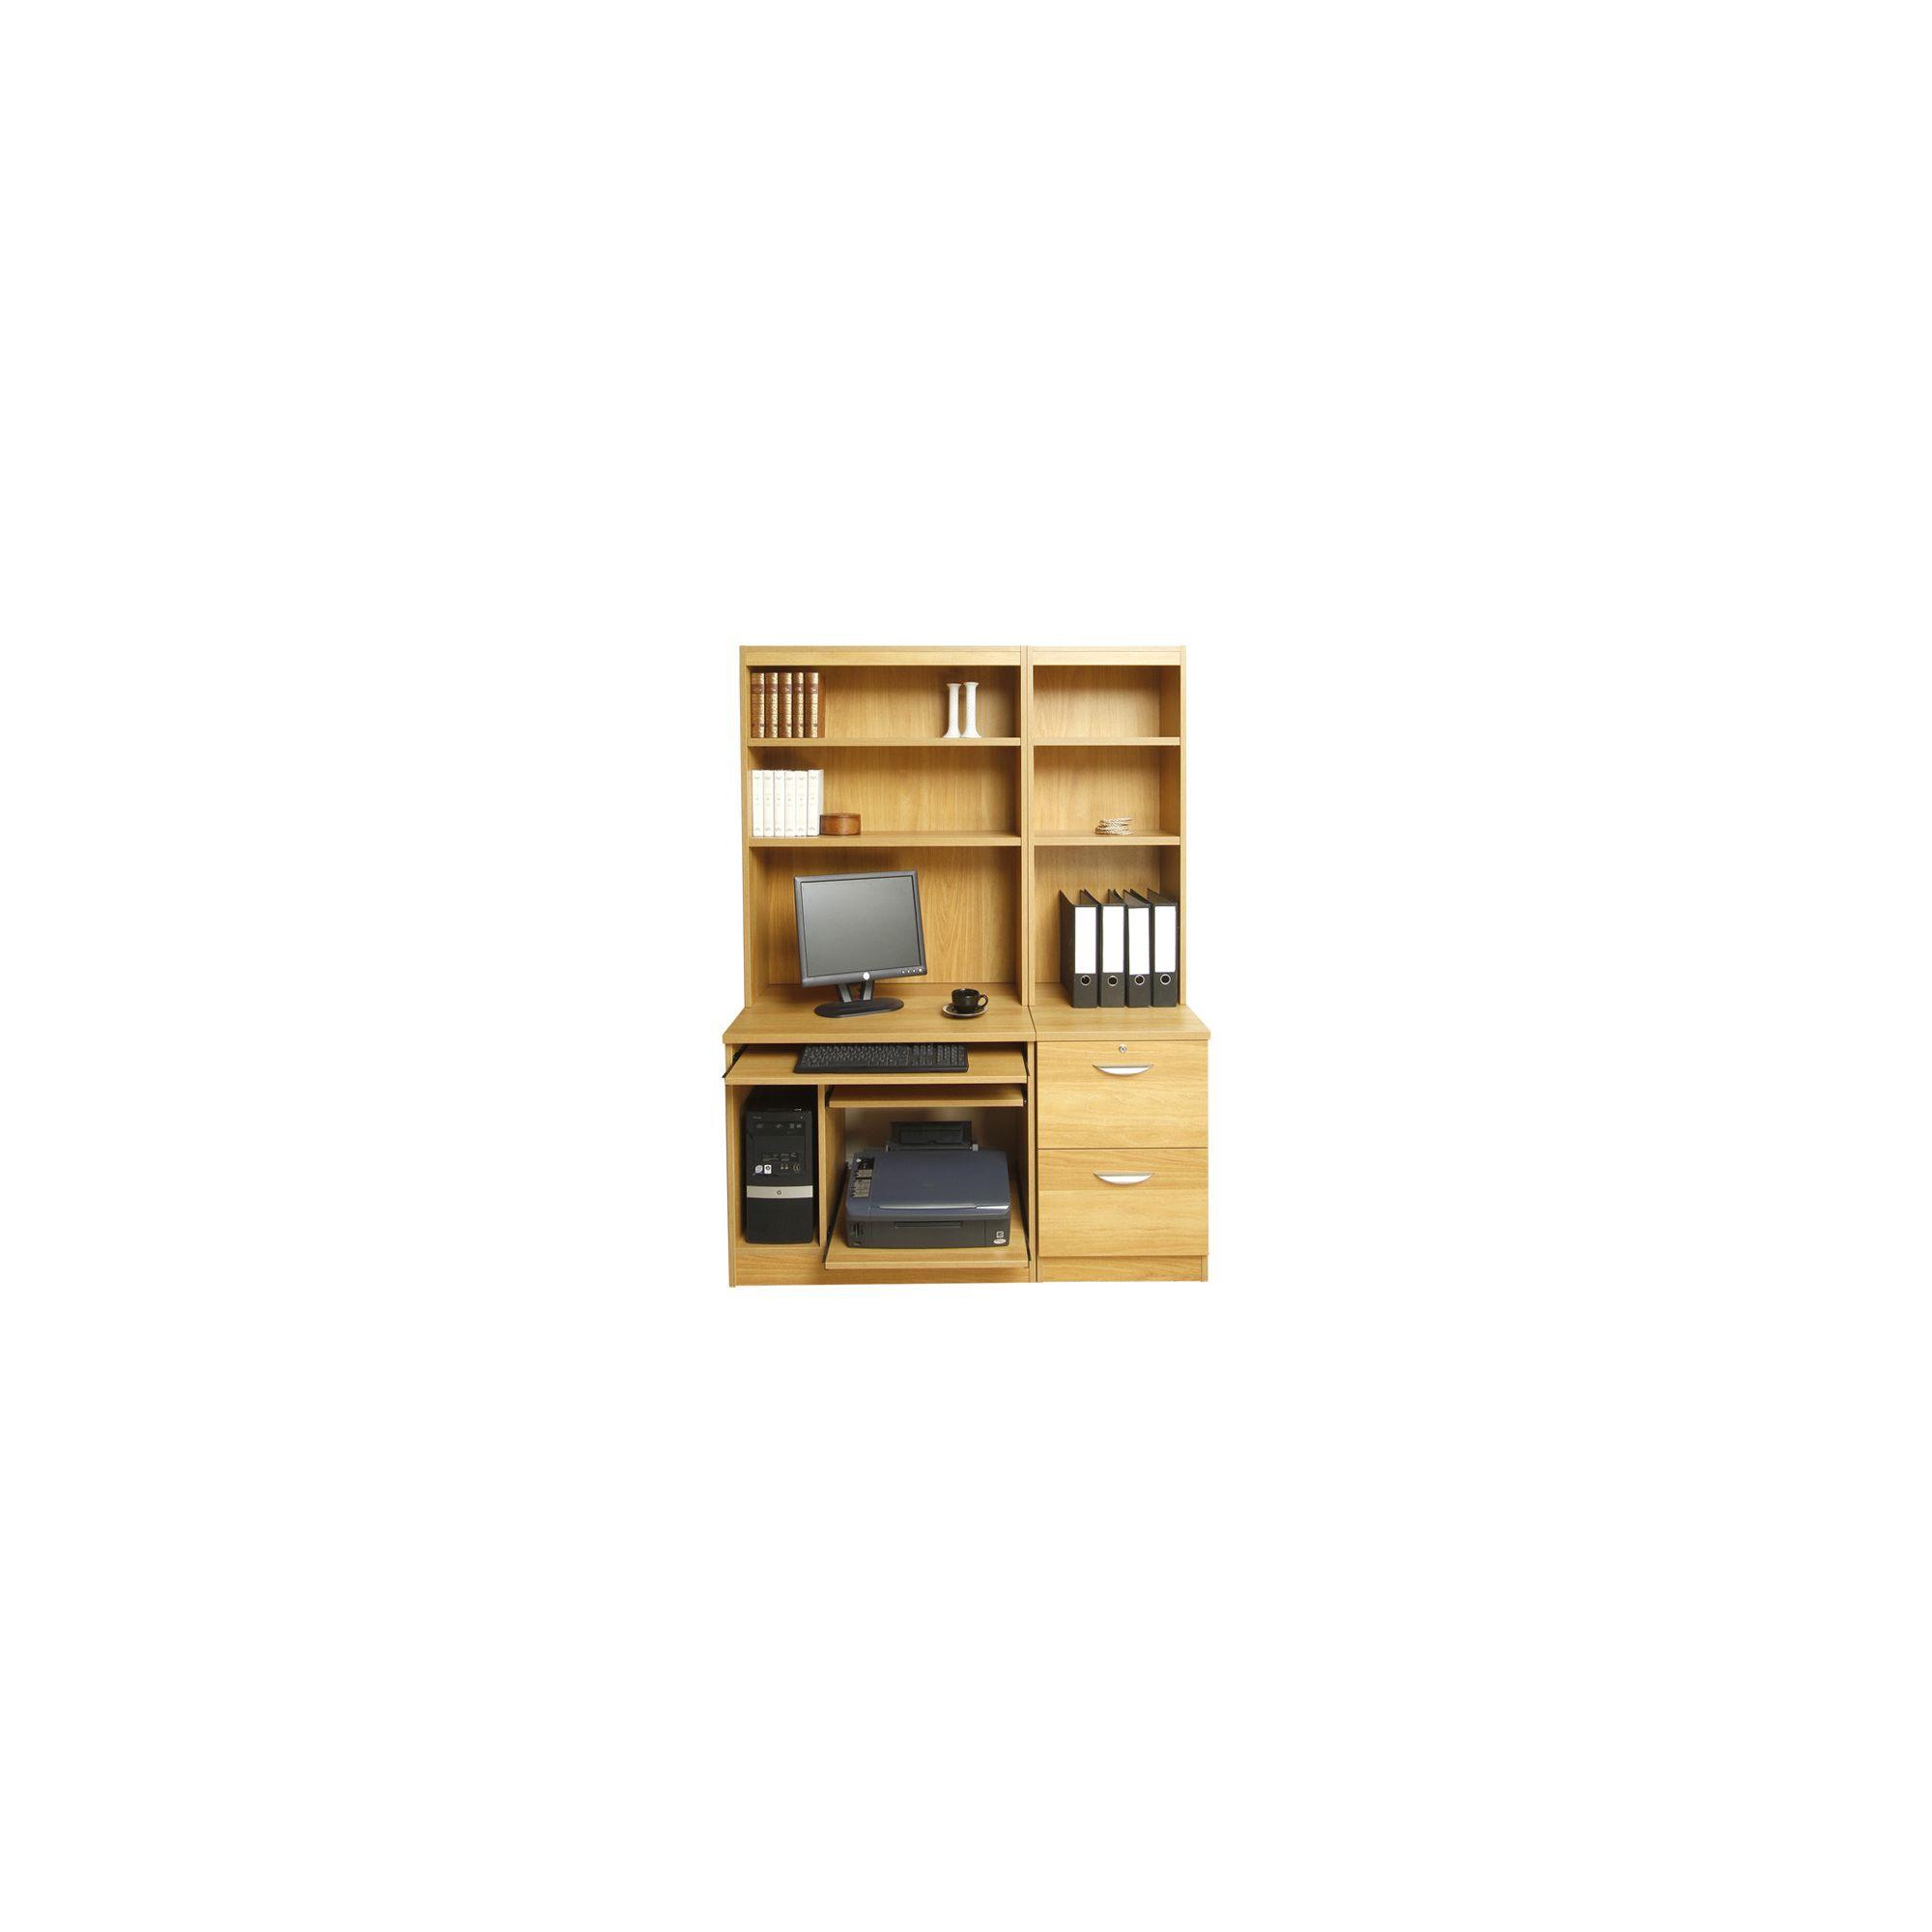 Enduro Home Office Desk / Workstation with Pedestal, Printer / CPU Storage and Inbuilt Bookshelves - Walnut at Tesco Direct